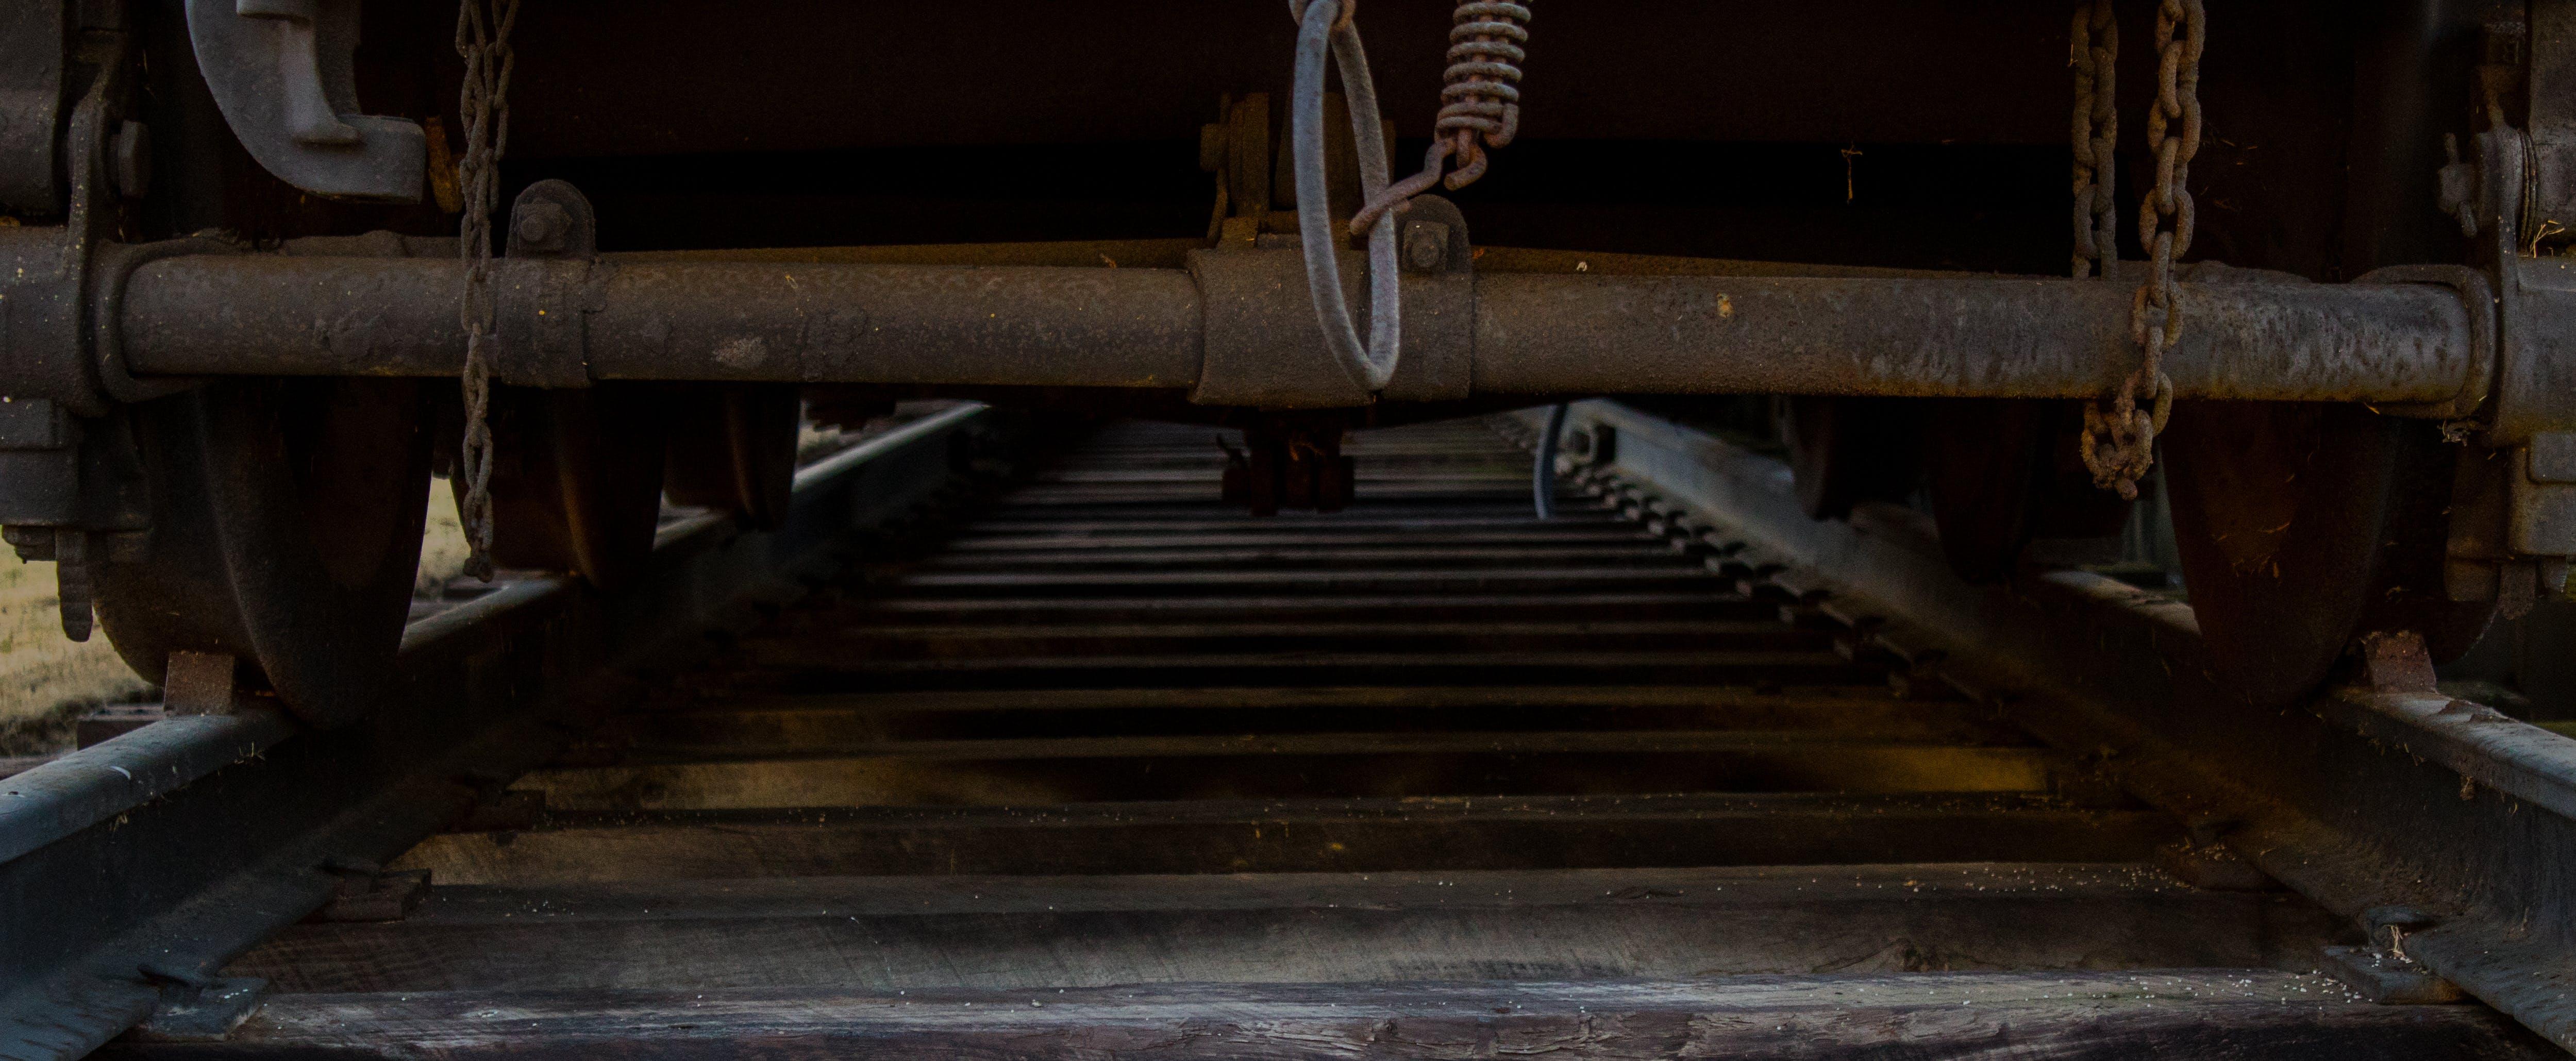 Free stock photo of wood, dark, train, tracks